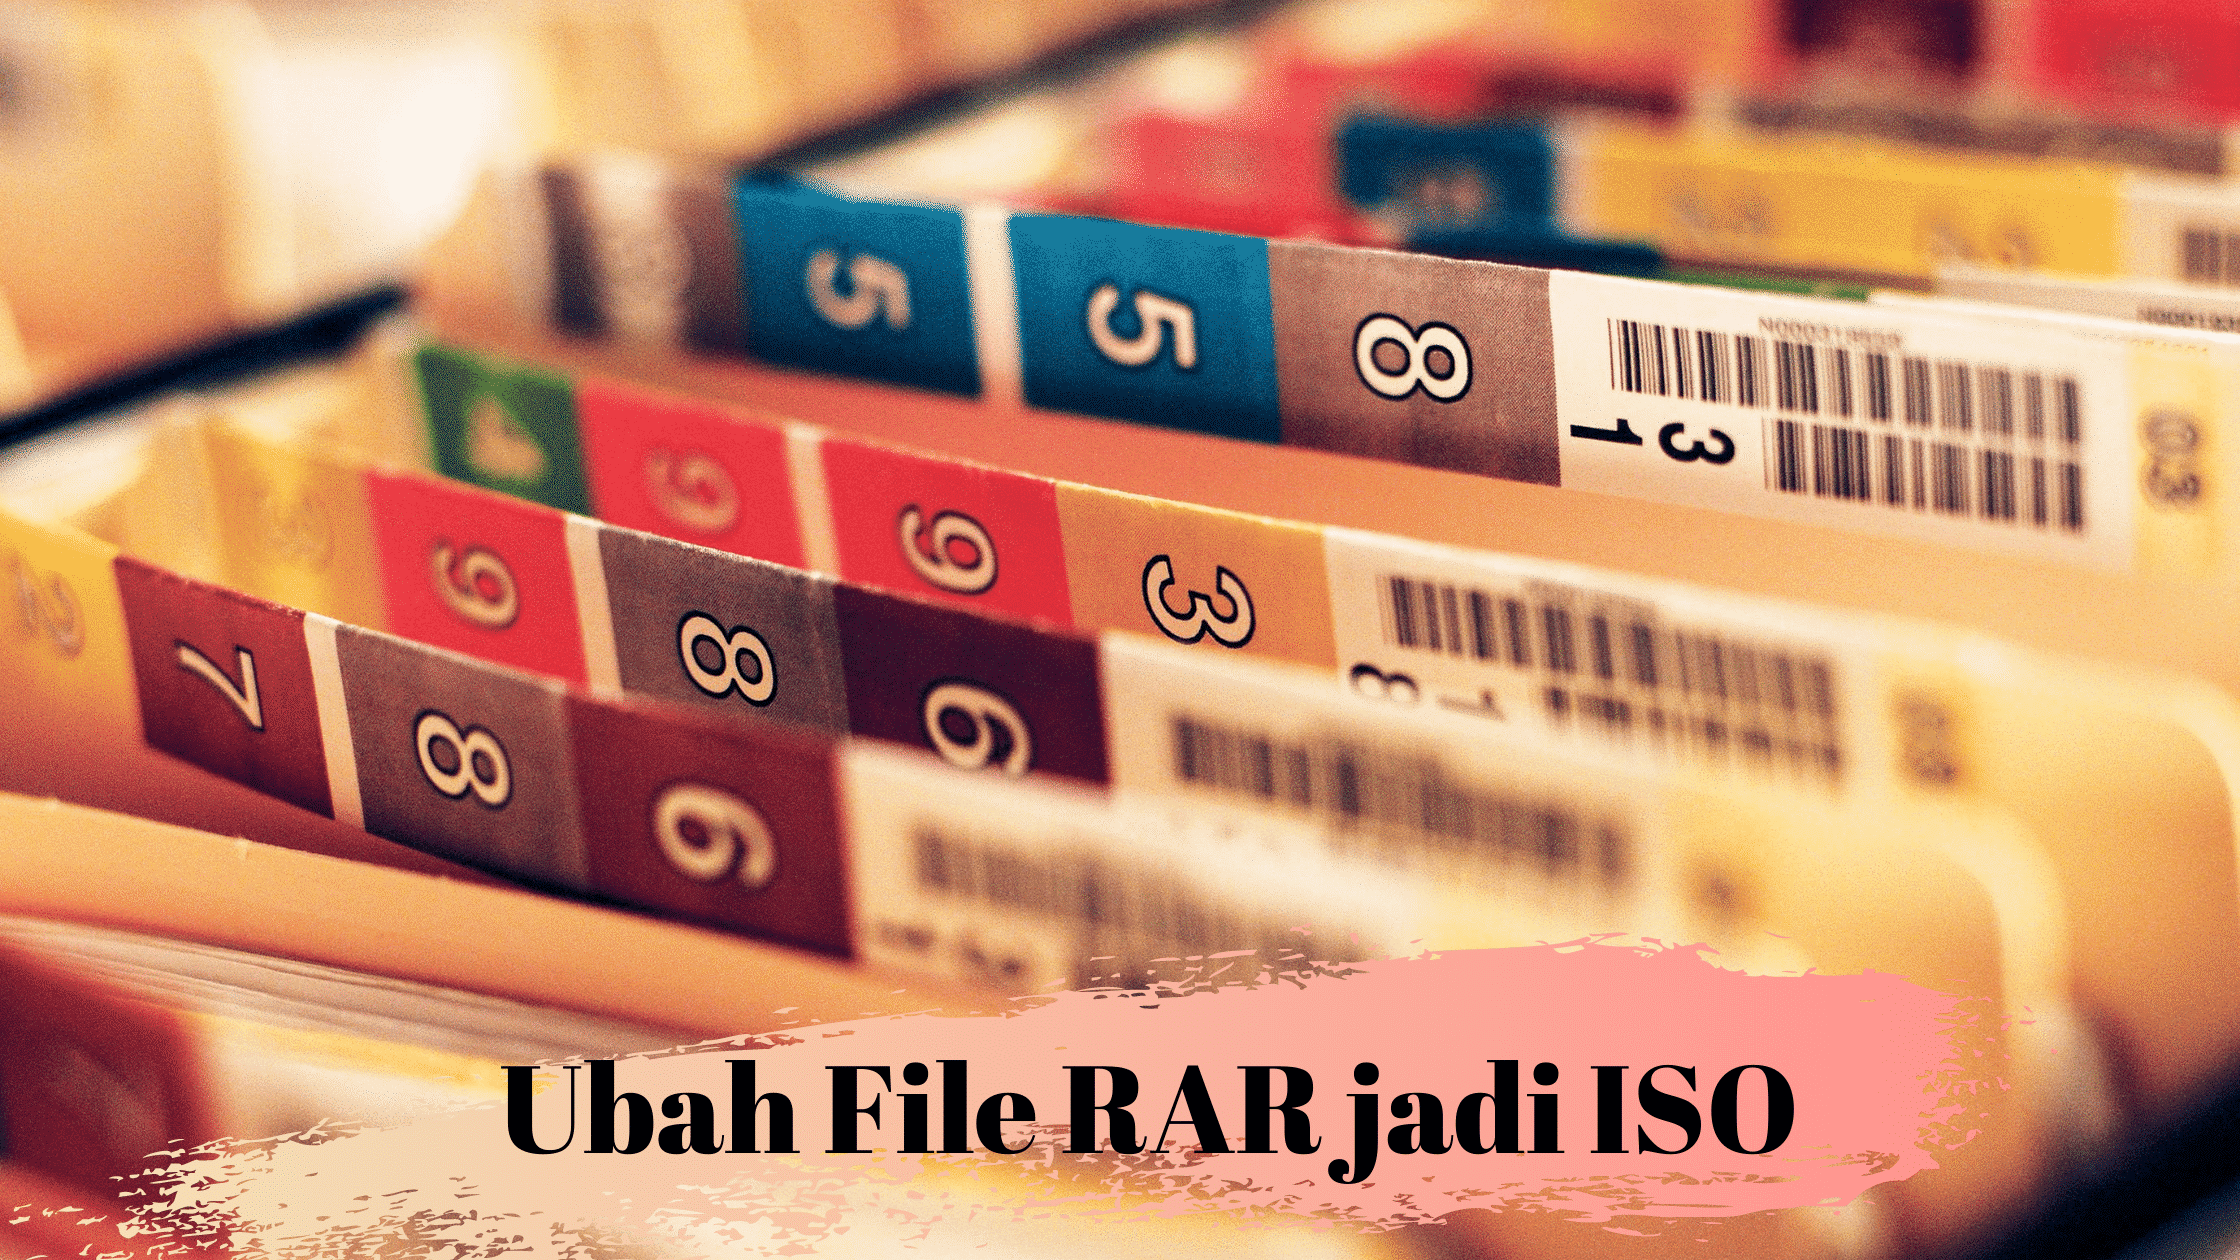 Ubah File RAR jadi ISO